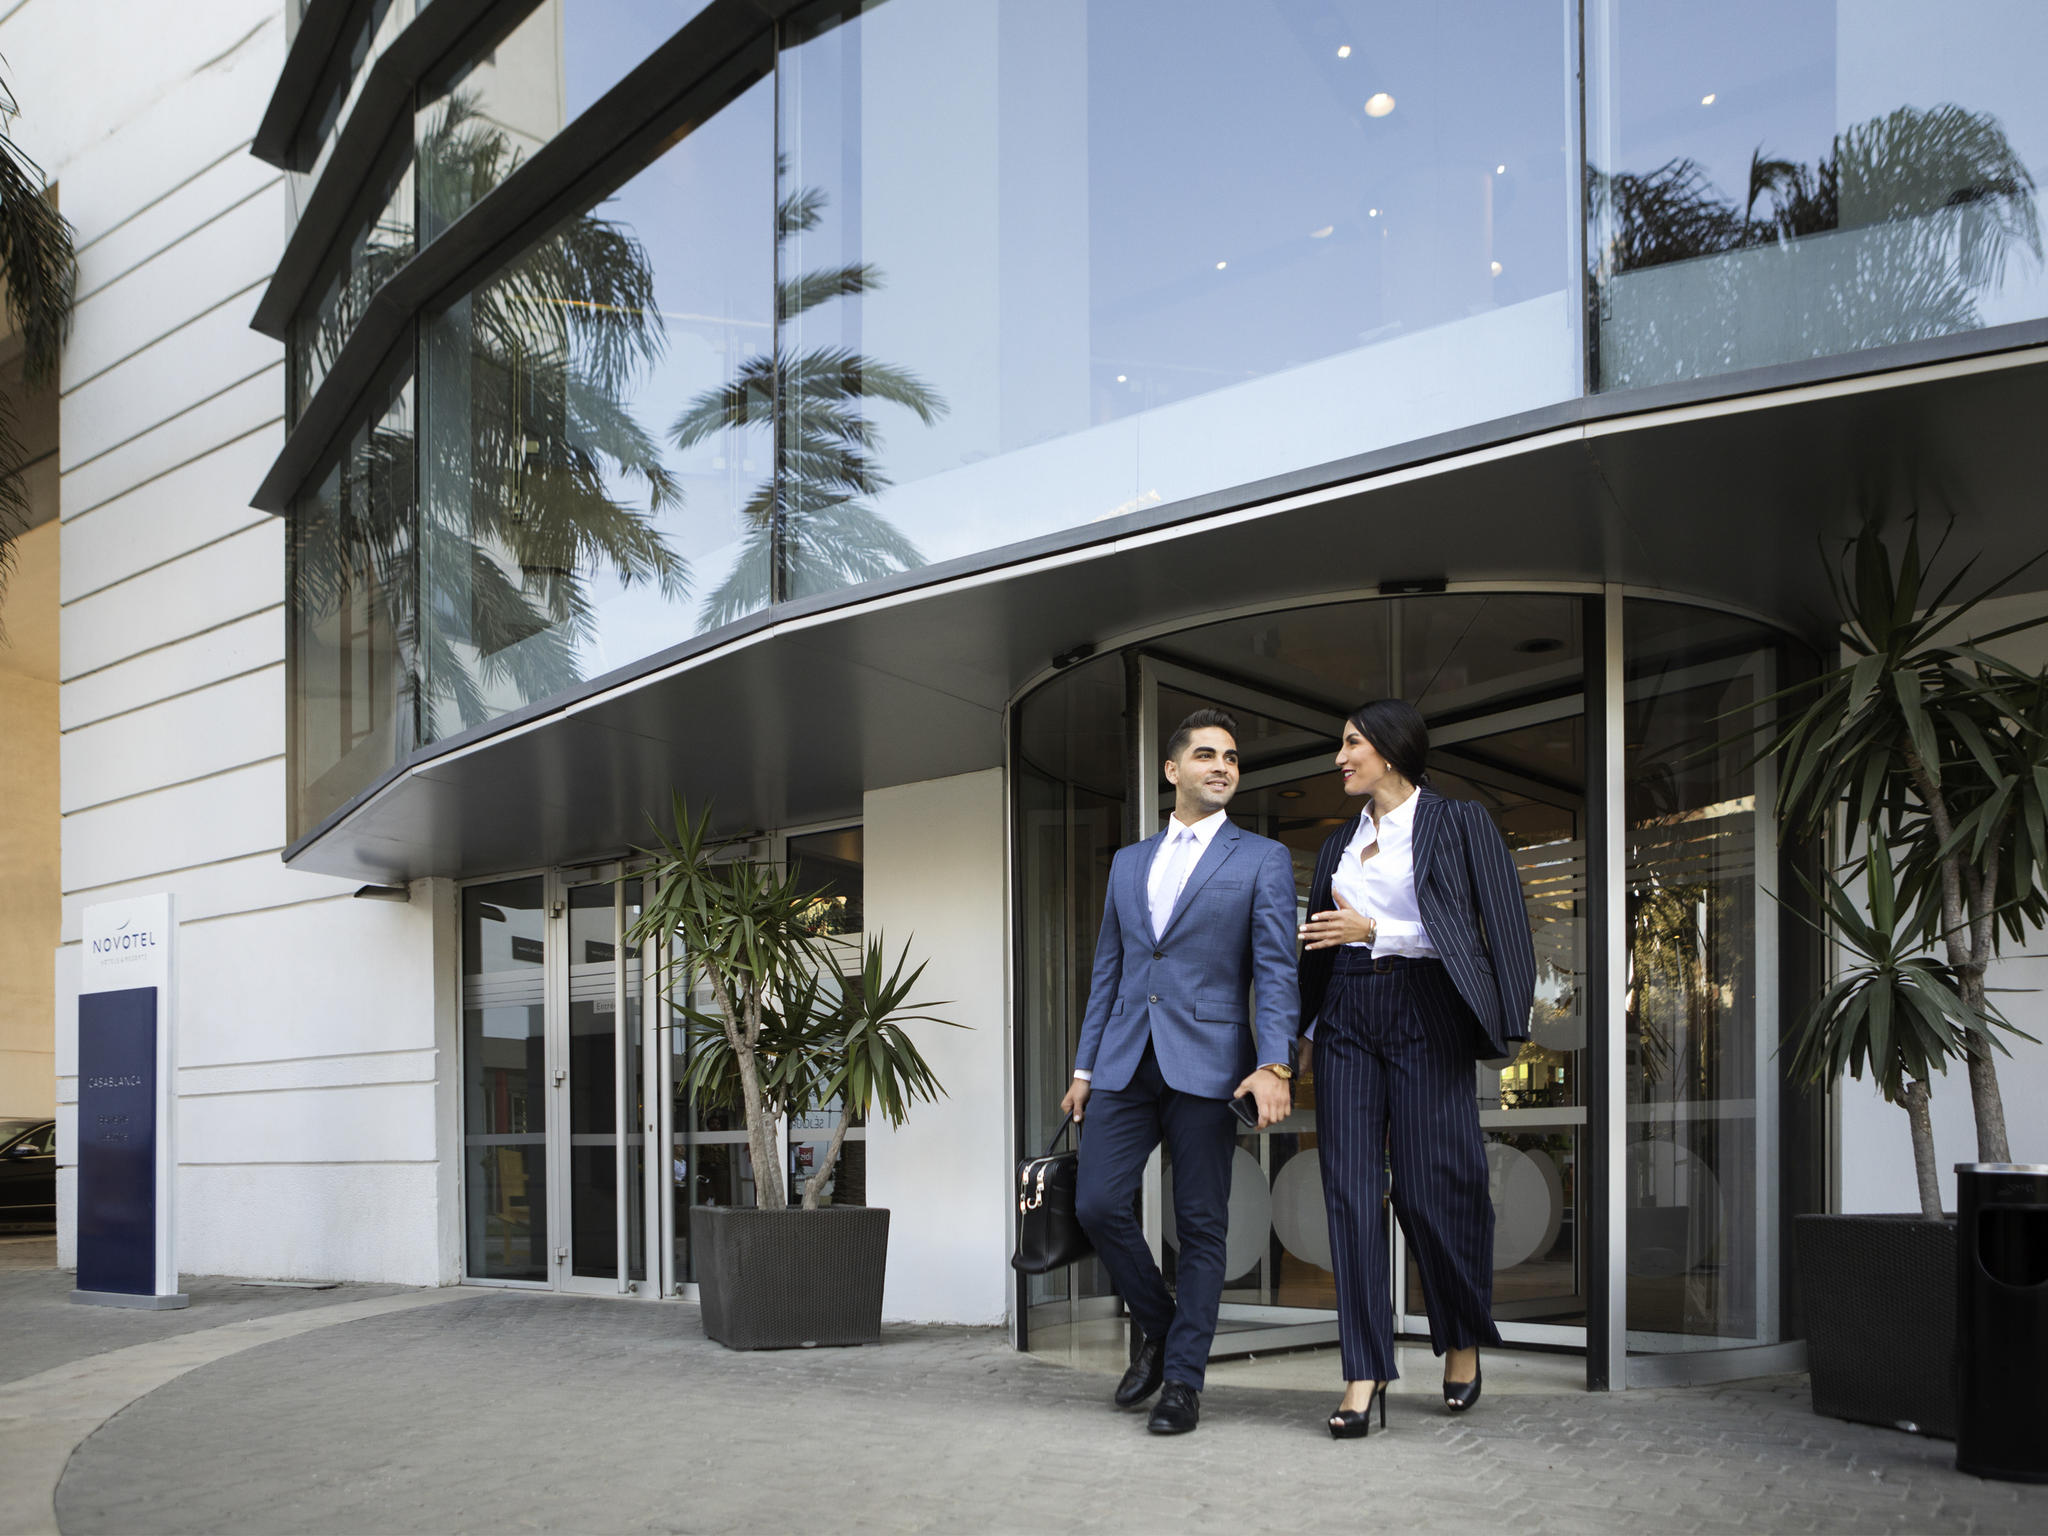 Hotel - Novotel Casablanca City Center